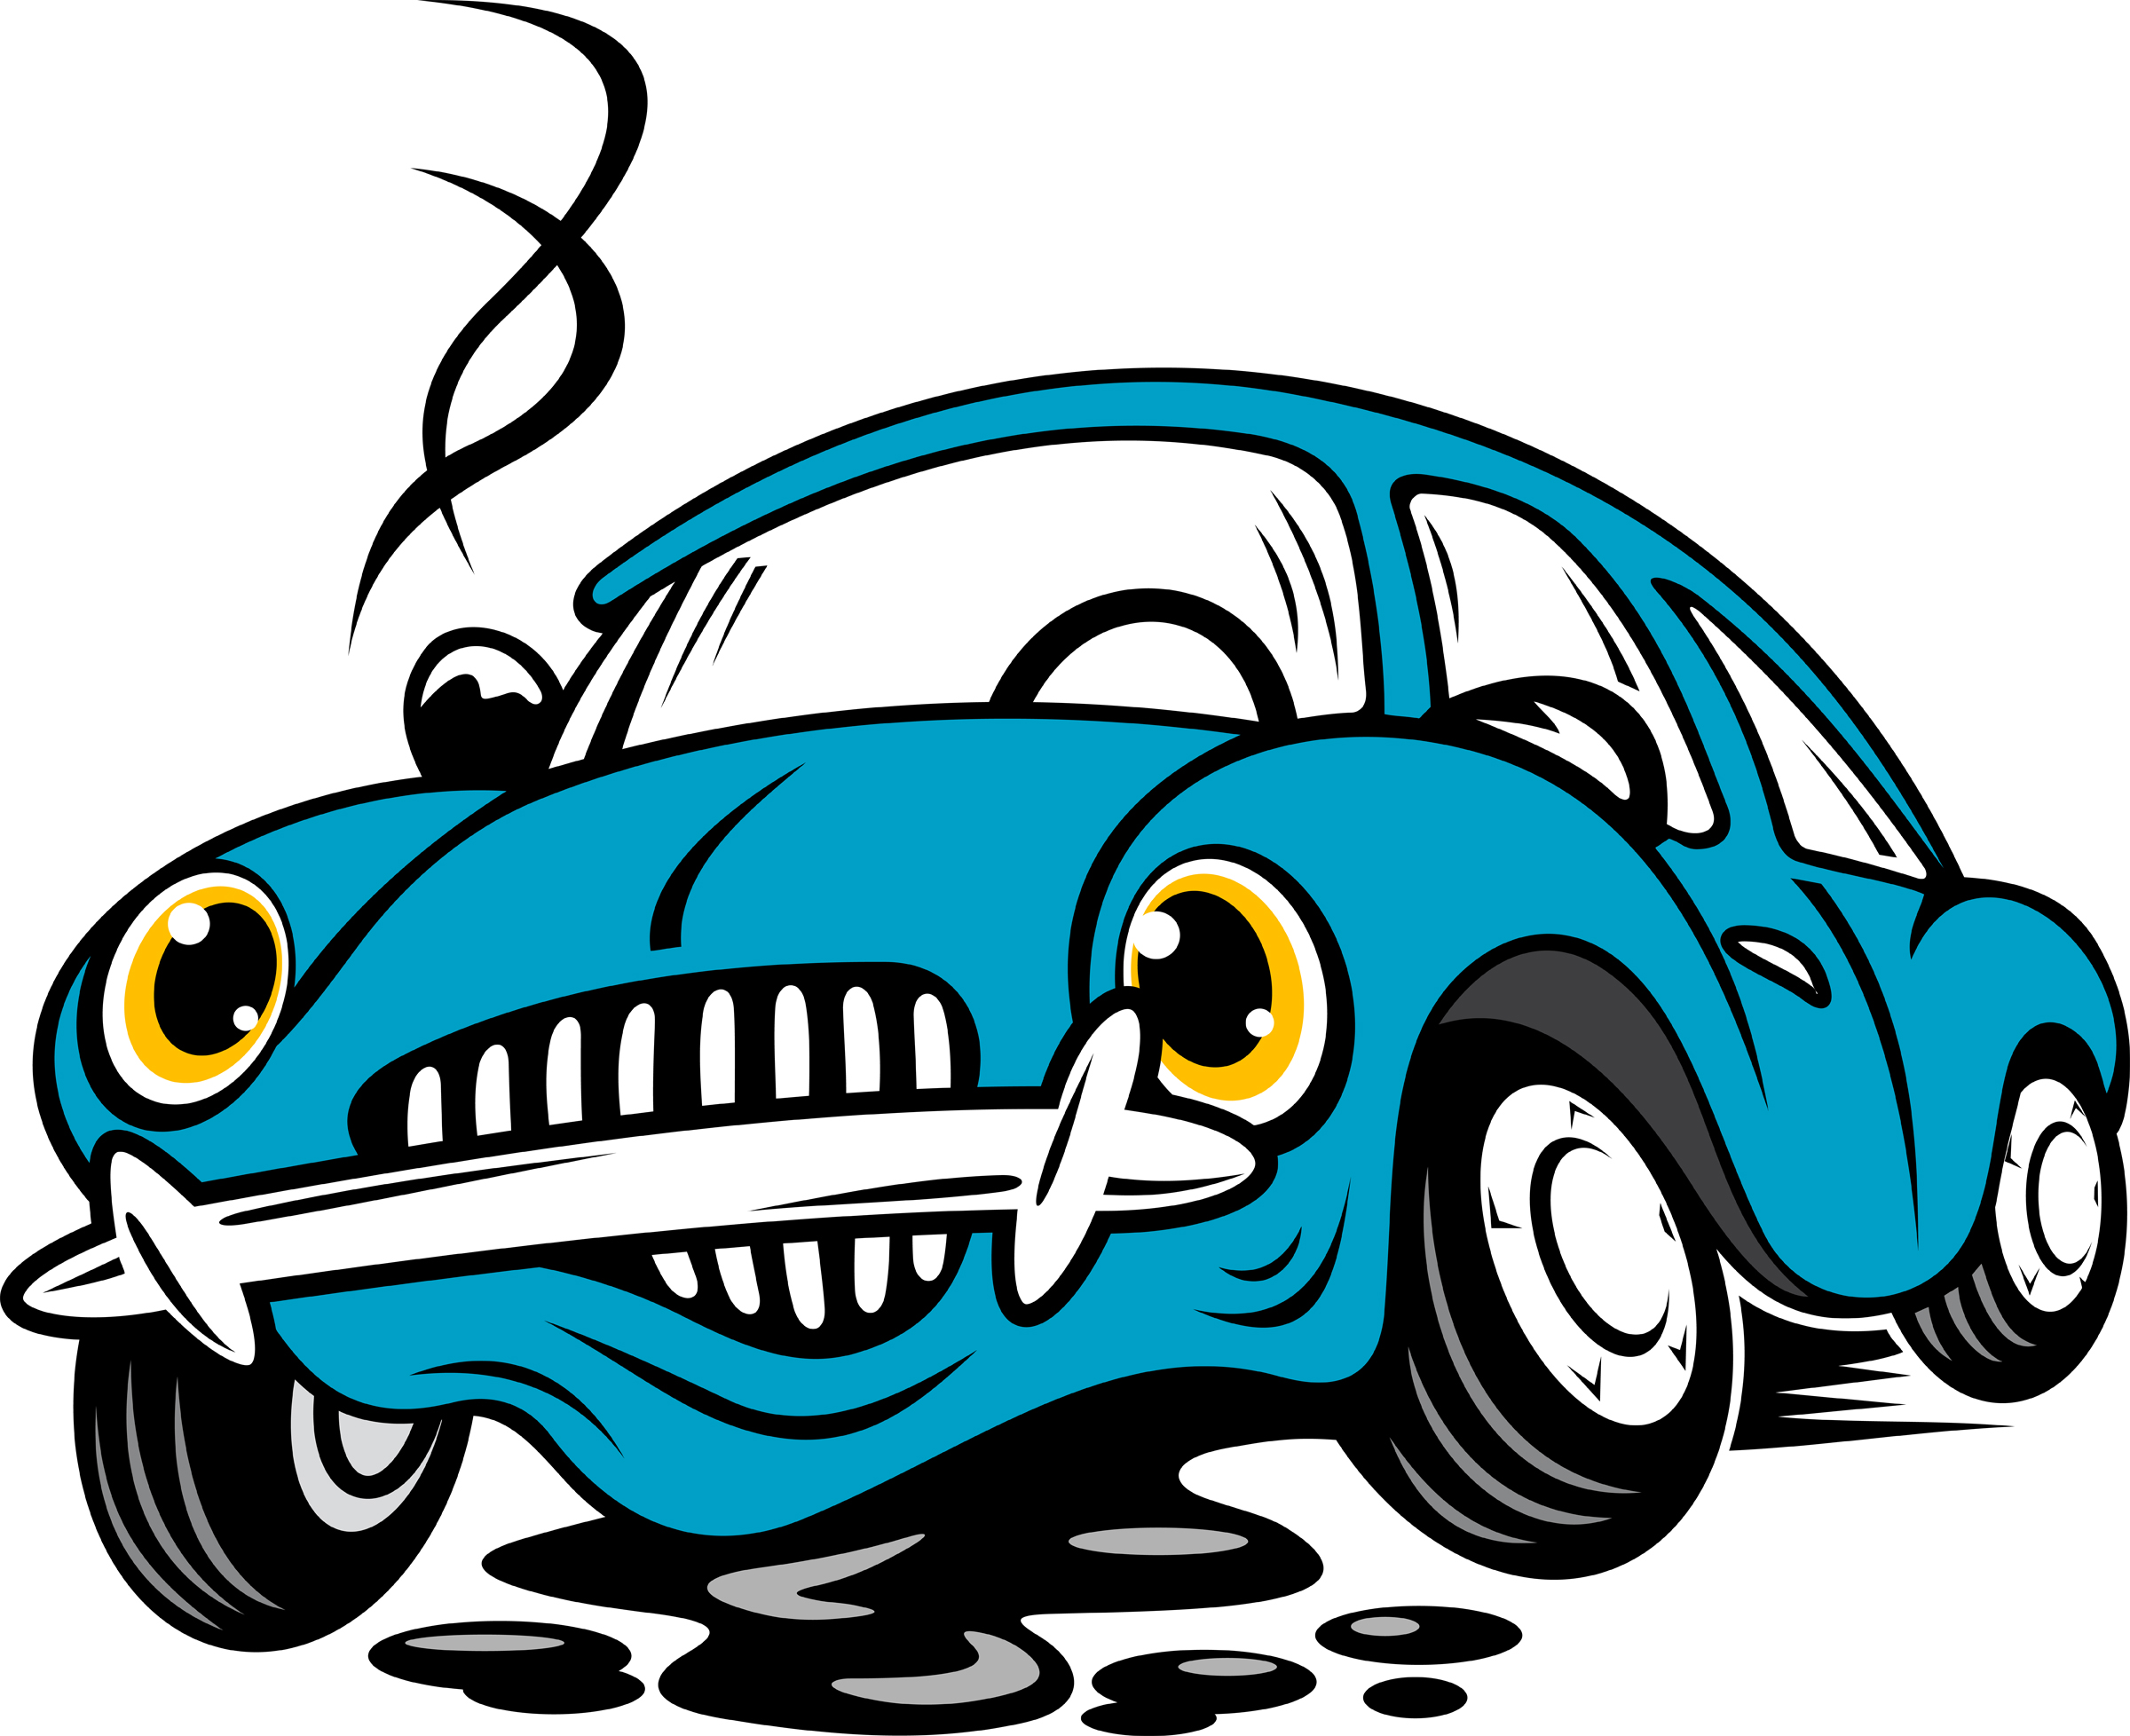 Car smoke car clipart svg transparent download Smoking car clipart - ClipartFest svg transparent download